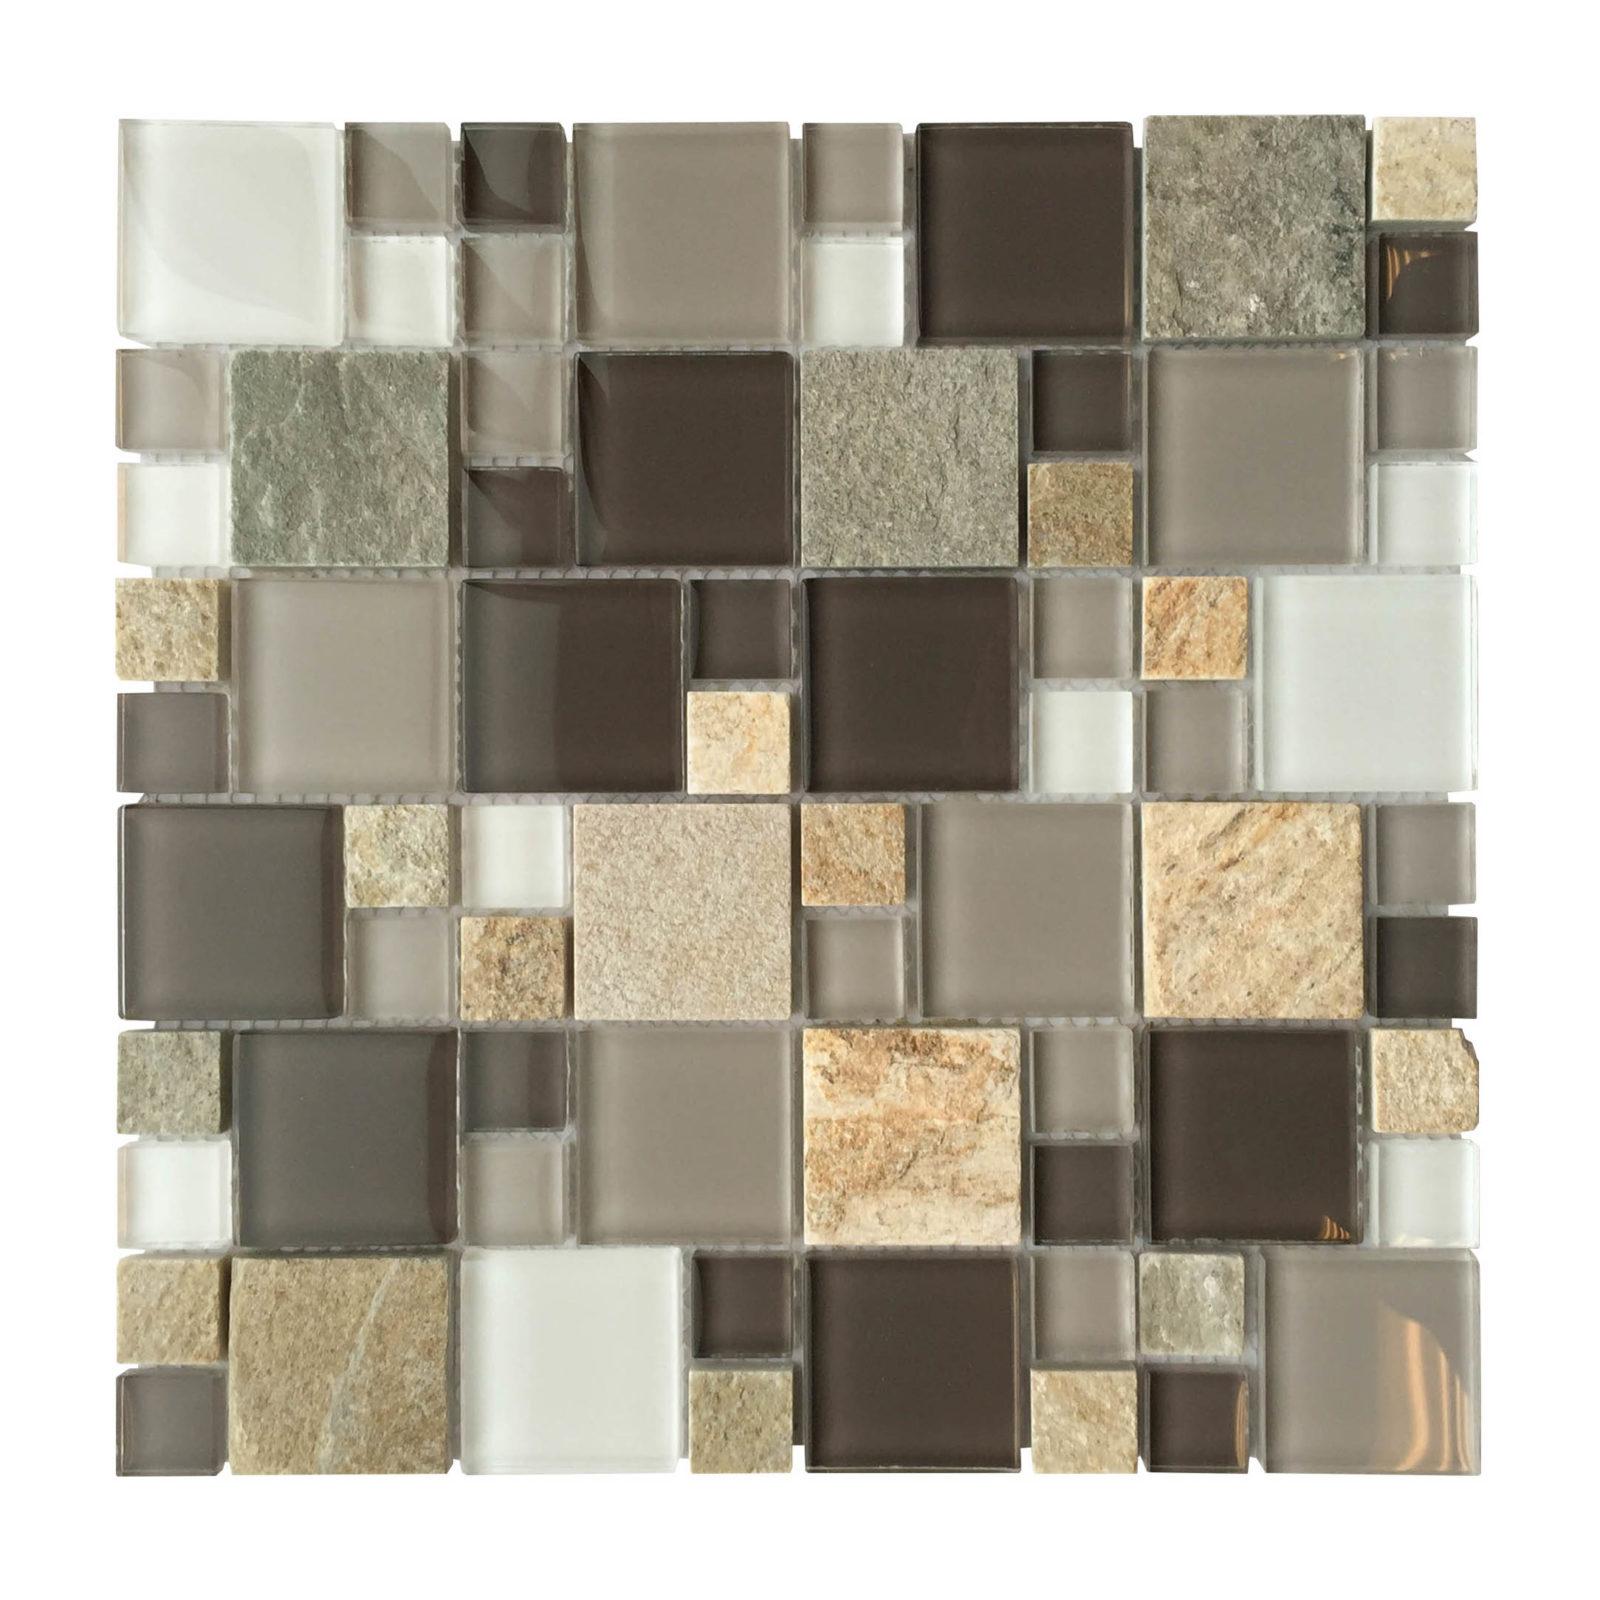 al1304 grey glass slate mixed modular 12 x 12 mosaic